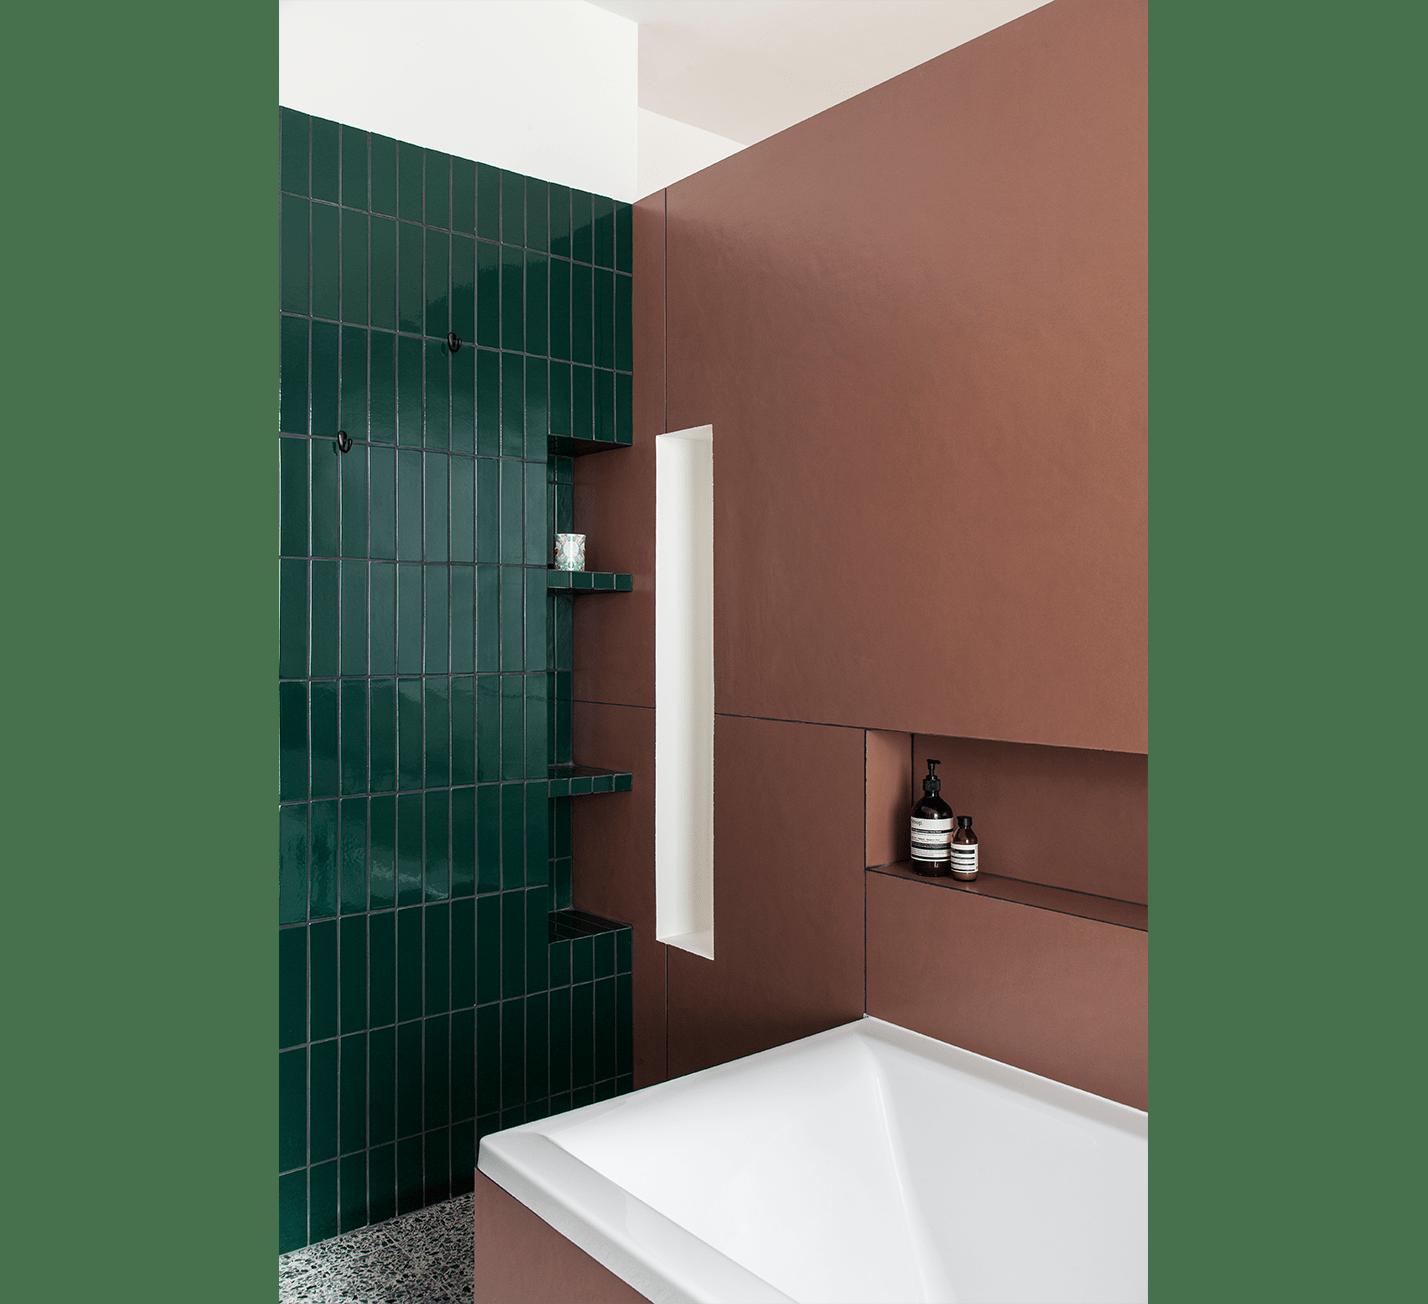 Projet-Arlequin-Atelier-Steve-Pauline-Borgia-Architecture-interieur-03-min